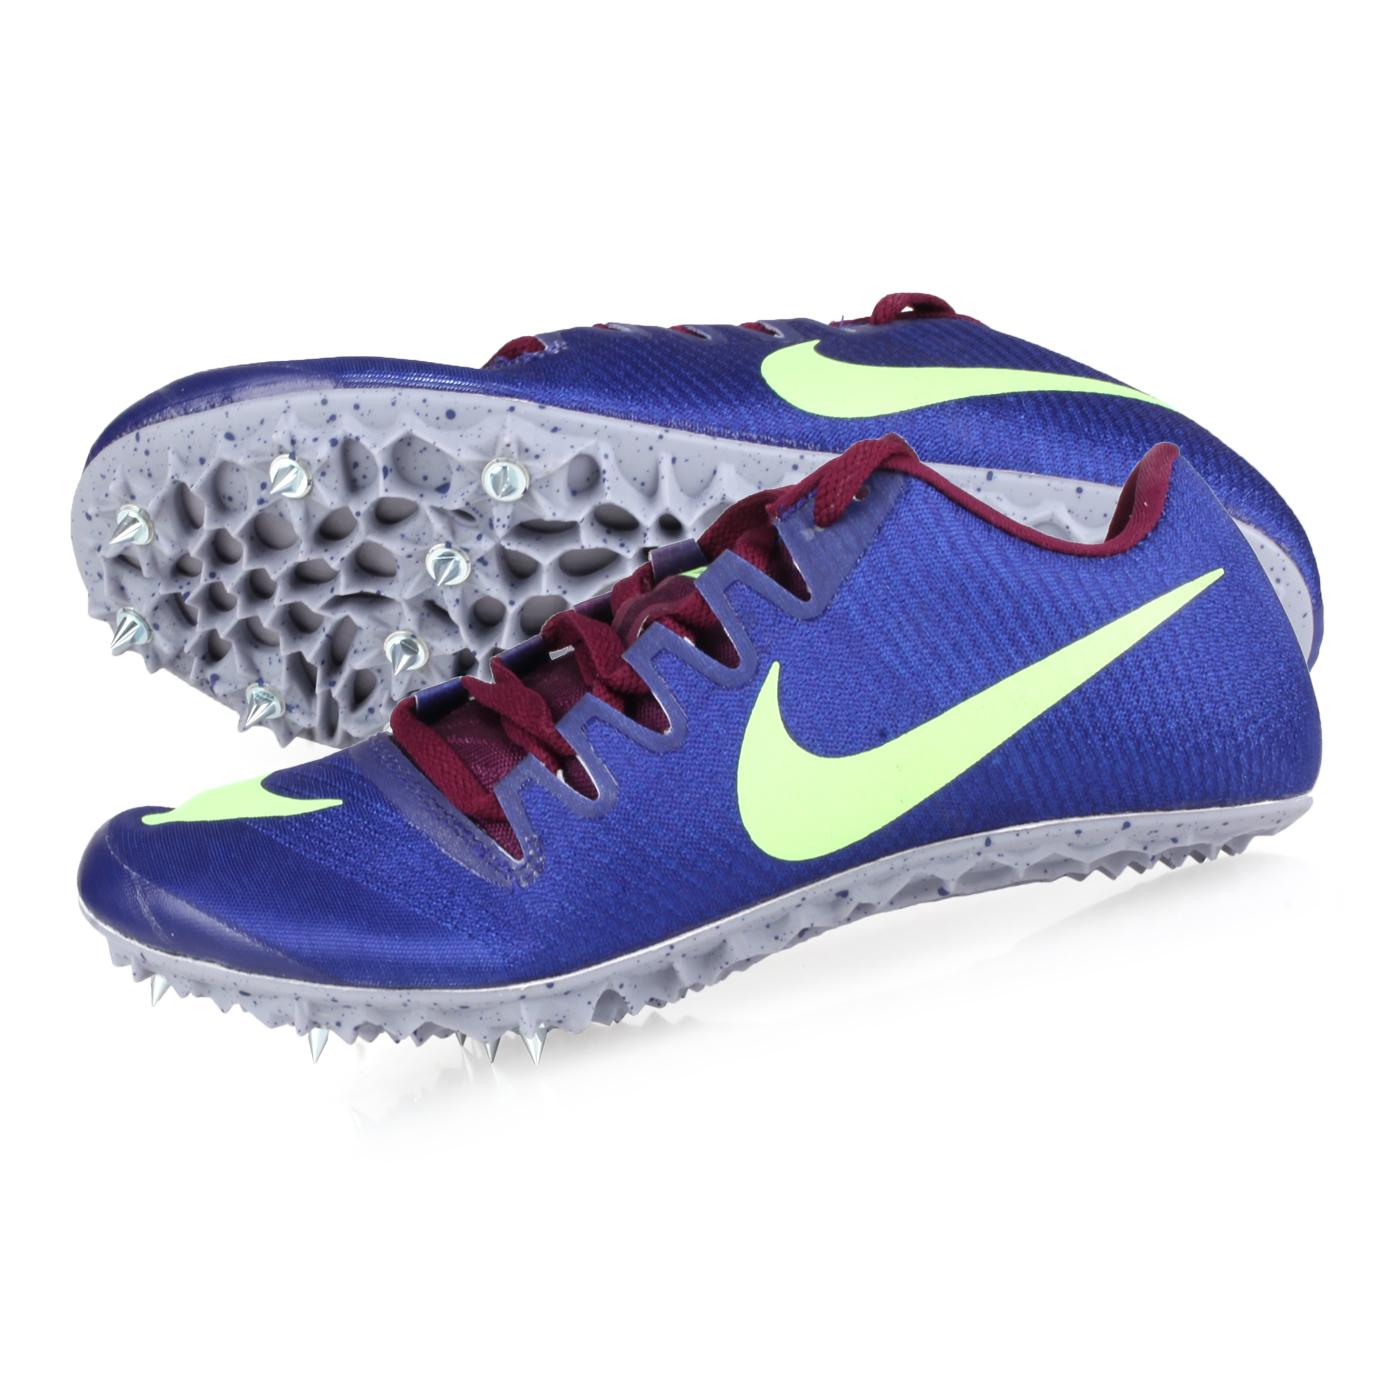 NIKE 田徑釘鞋(短距離)  @ZOOM JA FLY 3@865633001 - 藍紫螢光綠